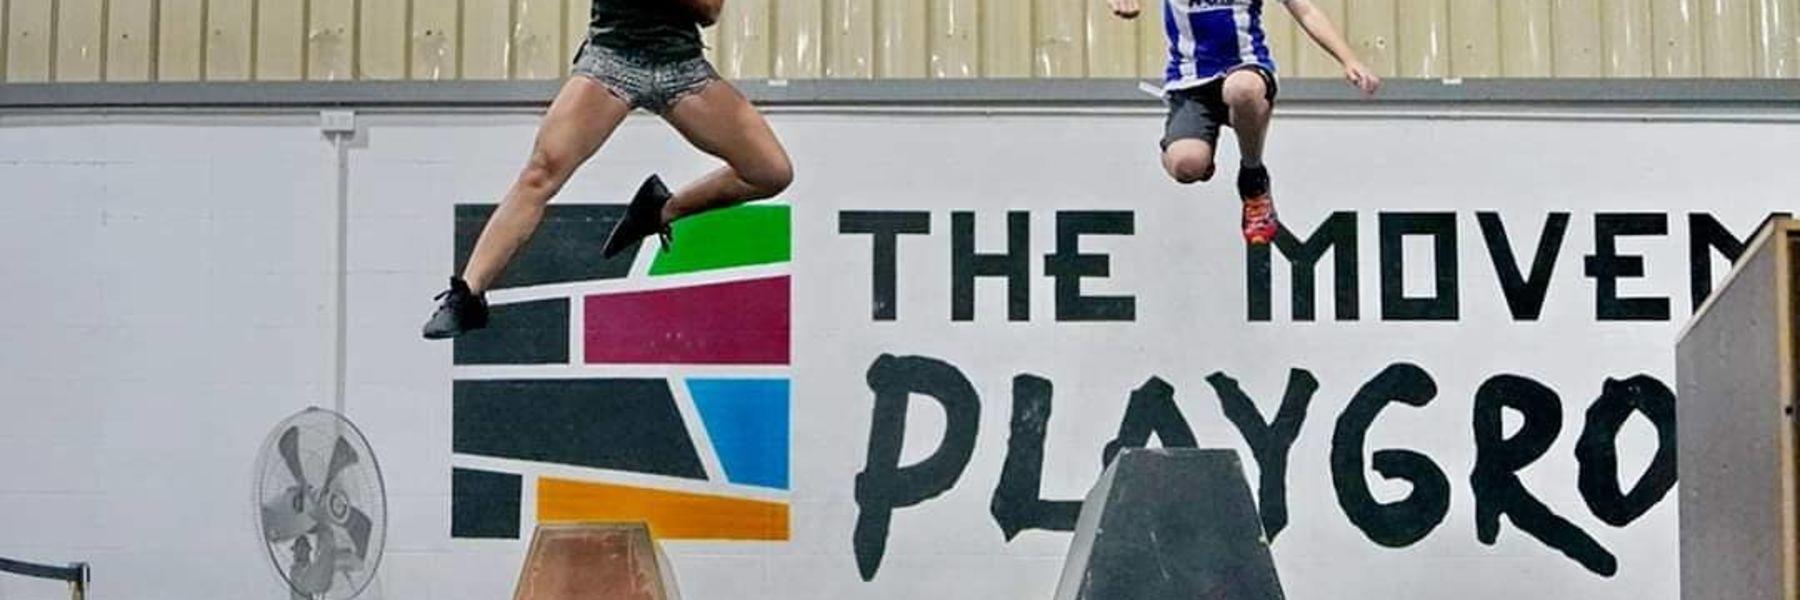 Movement Playground Decathlon Bangna image